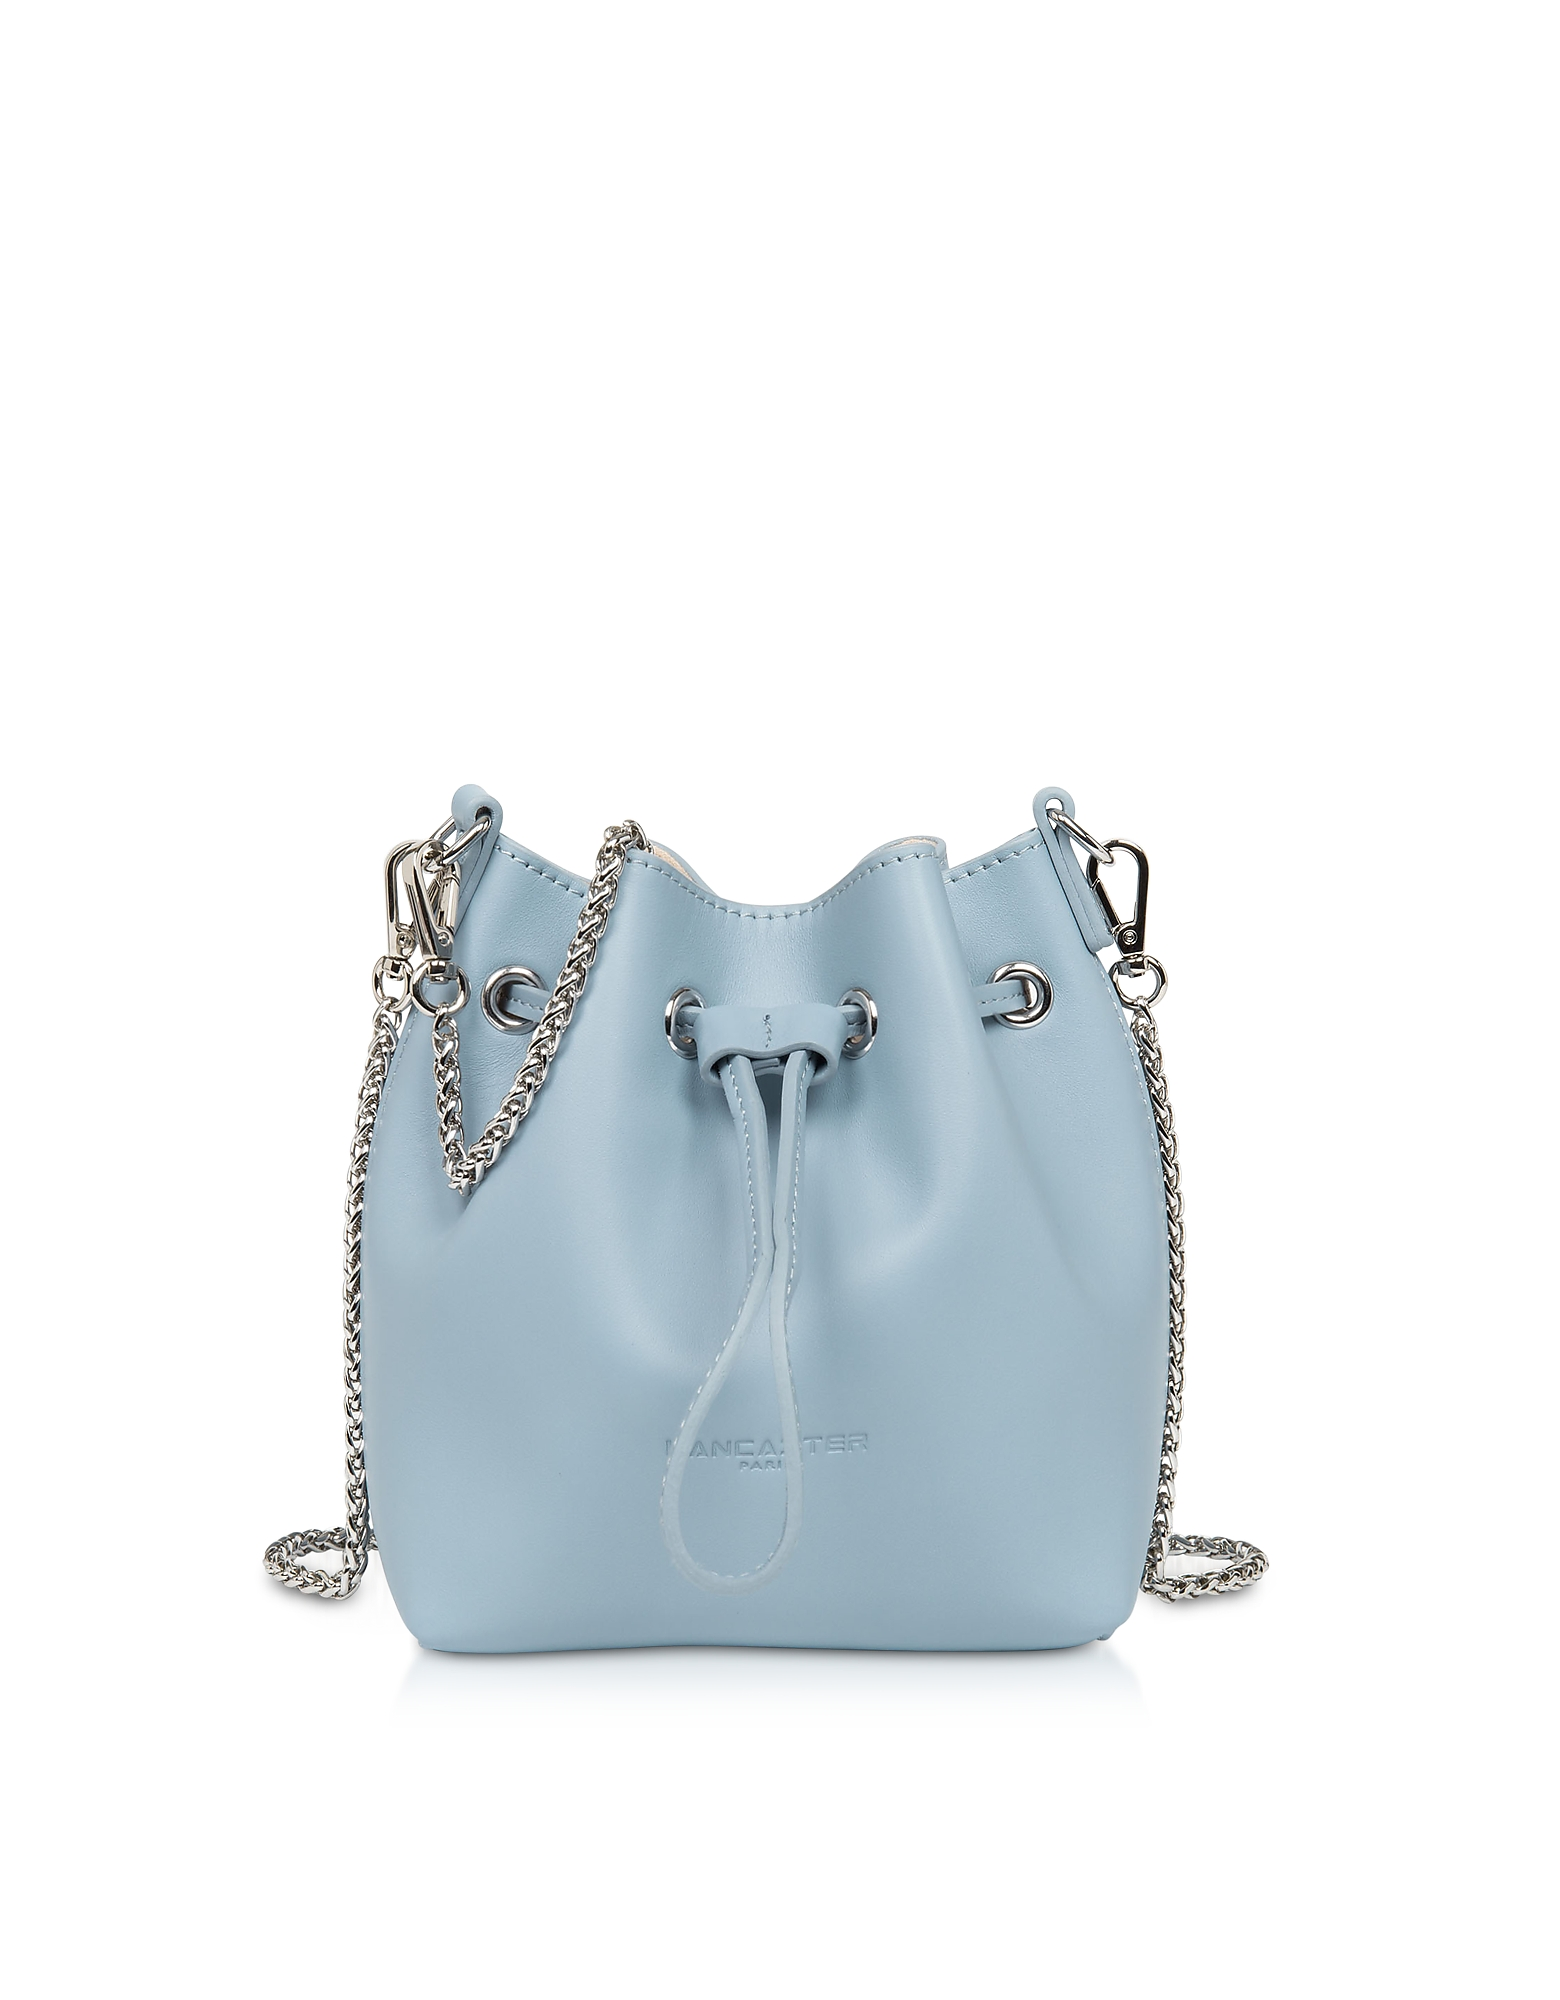 Lancaster Paris Handbags, Treasure and Annae Leather Mini Bucket Bag